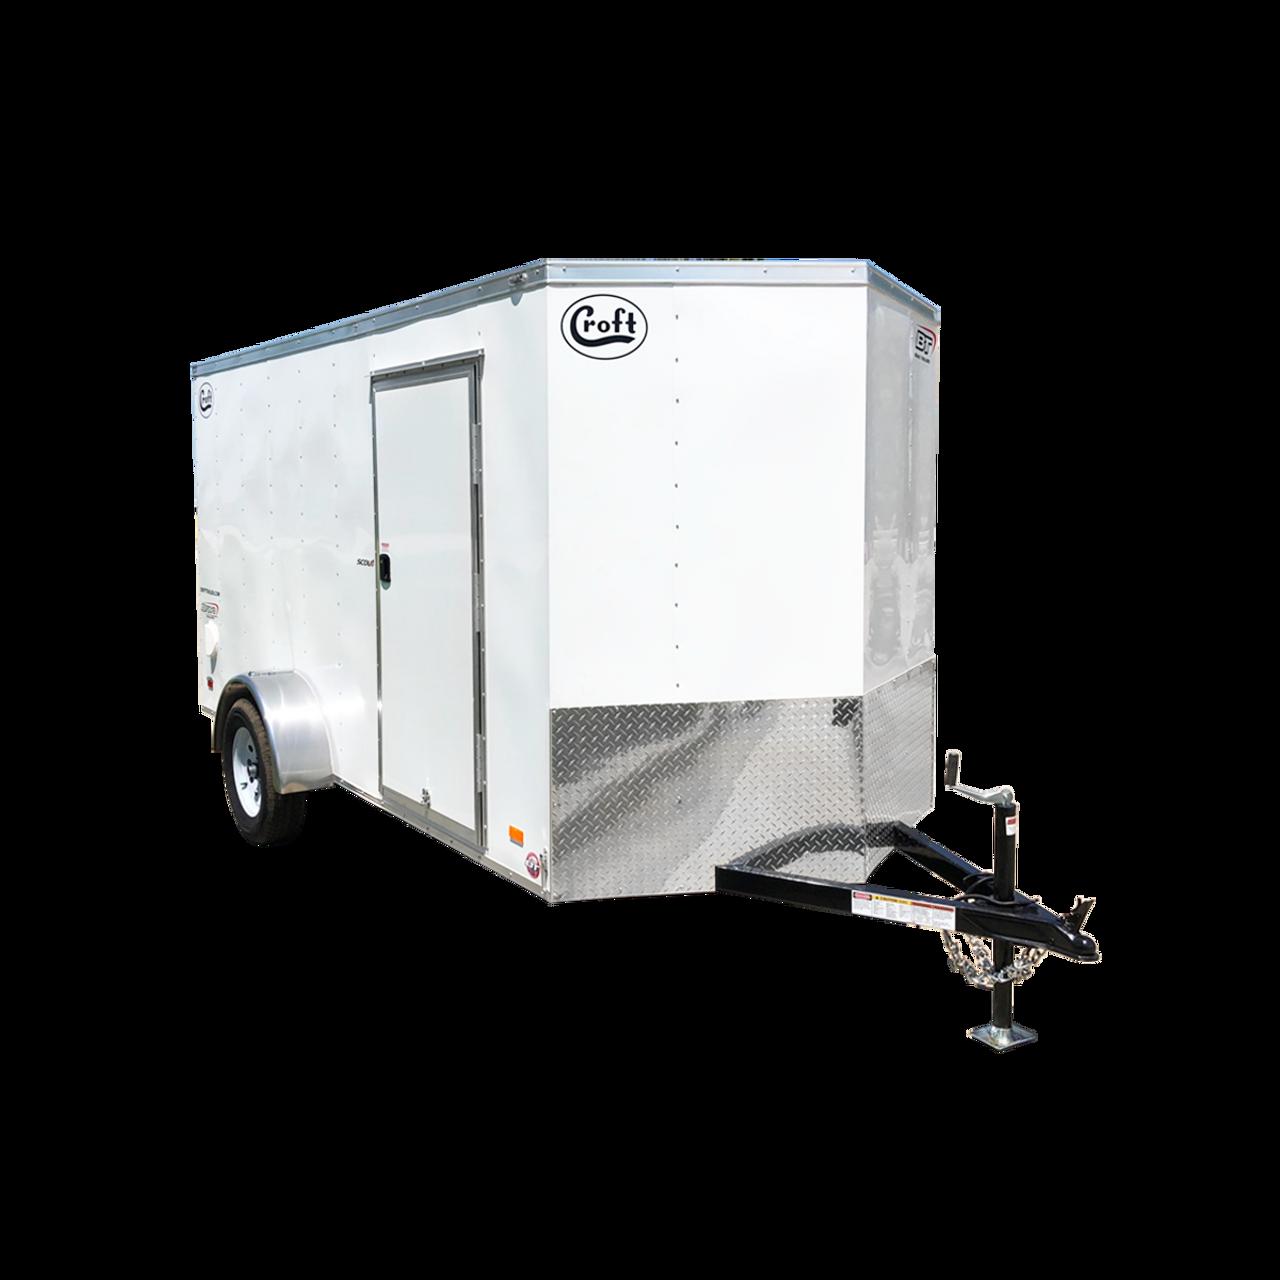 SC612SADRDGT --- 6' X 12' Enclosed Trailer with Ramp Door - Torsion - Bravo